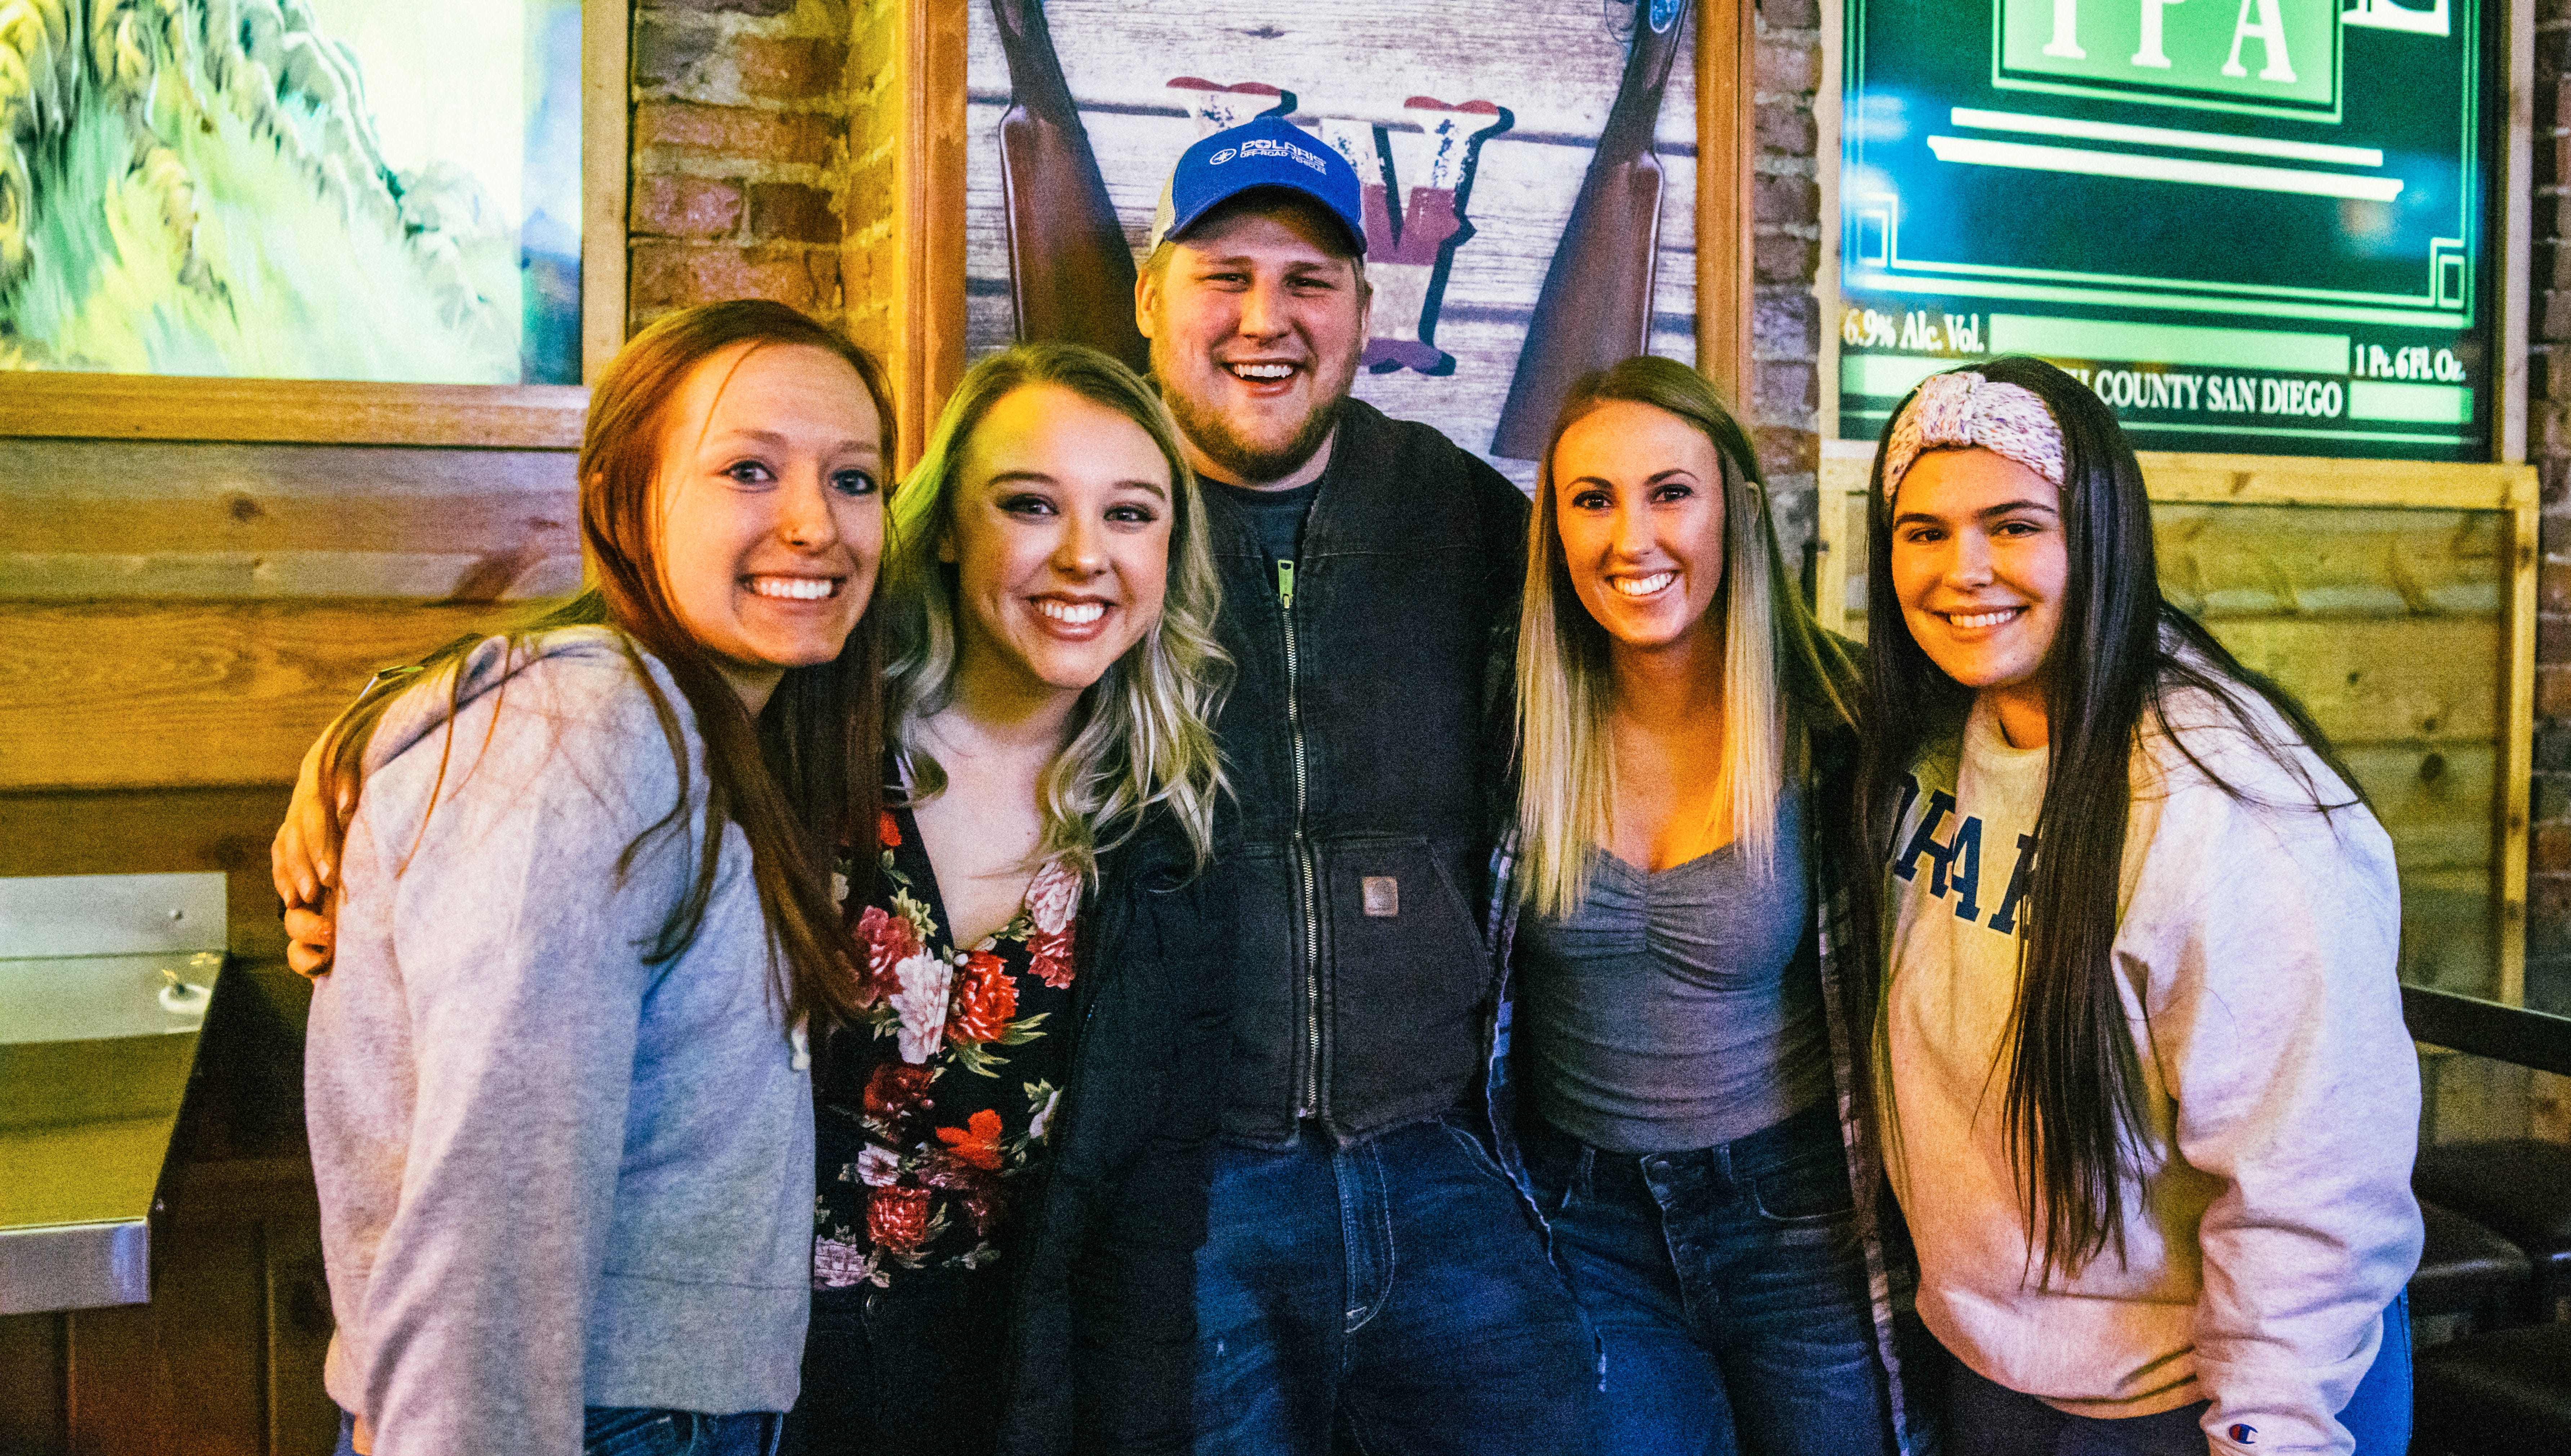 Katie Erickson, 22, Jacey Redman, 21, Glendan Mesch, 22, Elizabeth Ovrut, 22, and Baylee Heiden, 21, all of Des Moines, Friday, Dec. 14 at American Outlaws.